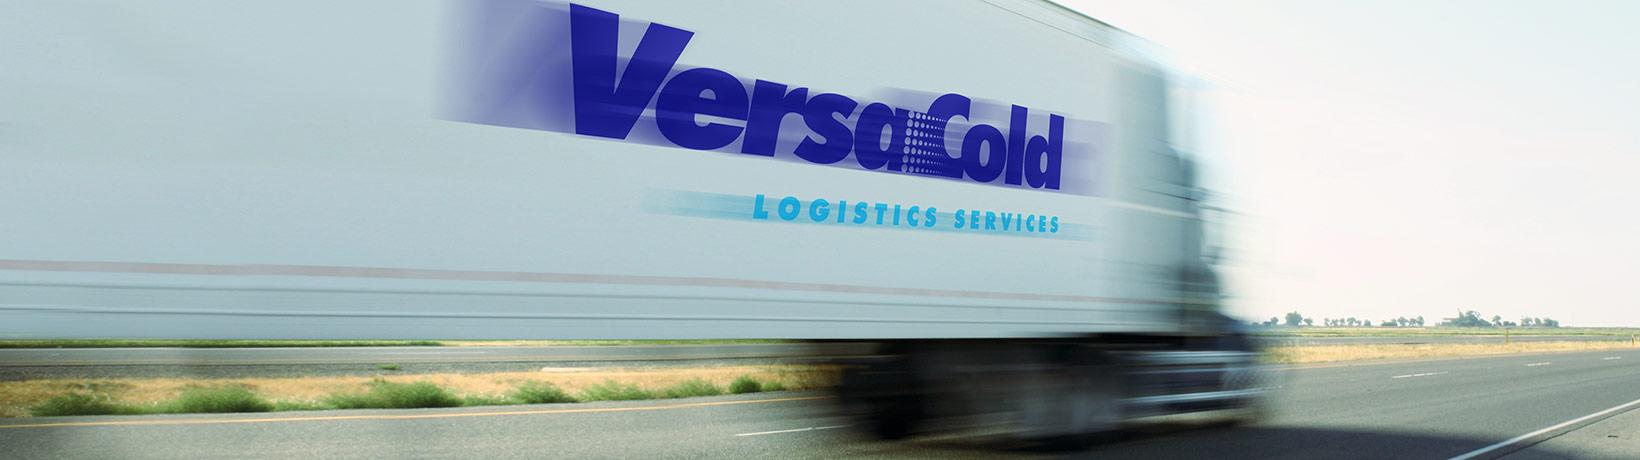 VersaCold-online-ad--banner.jpeg